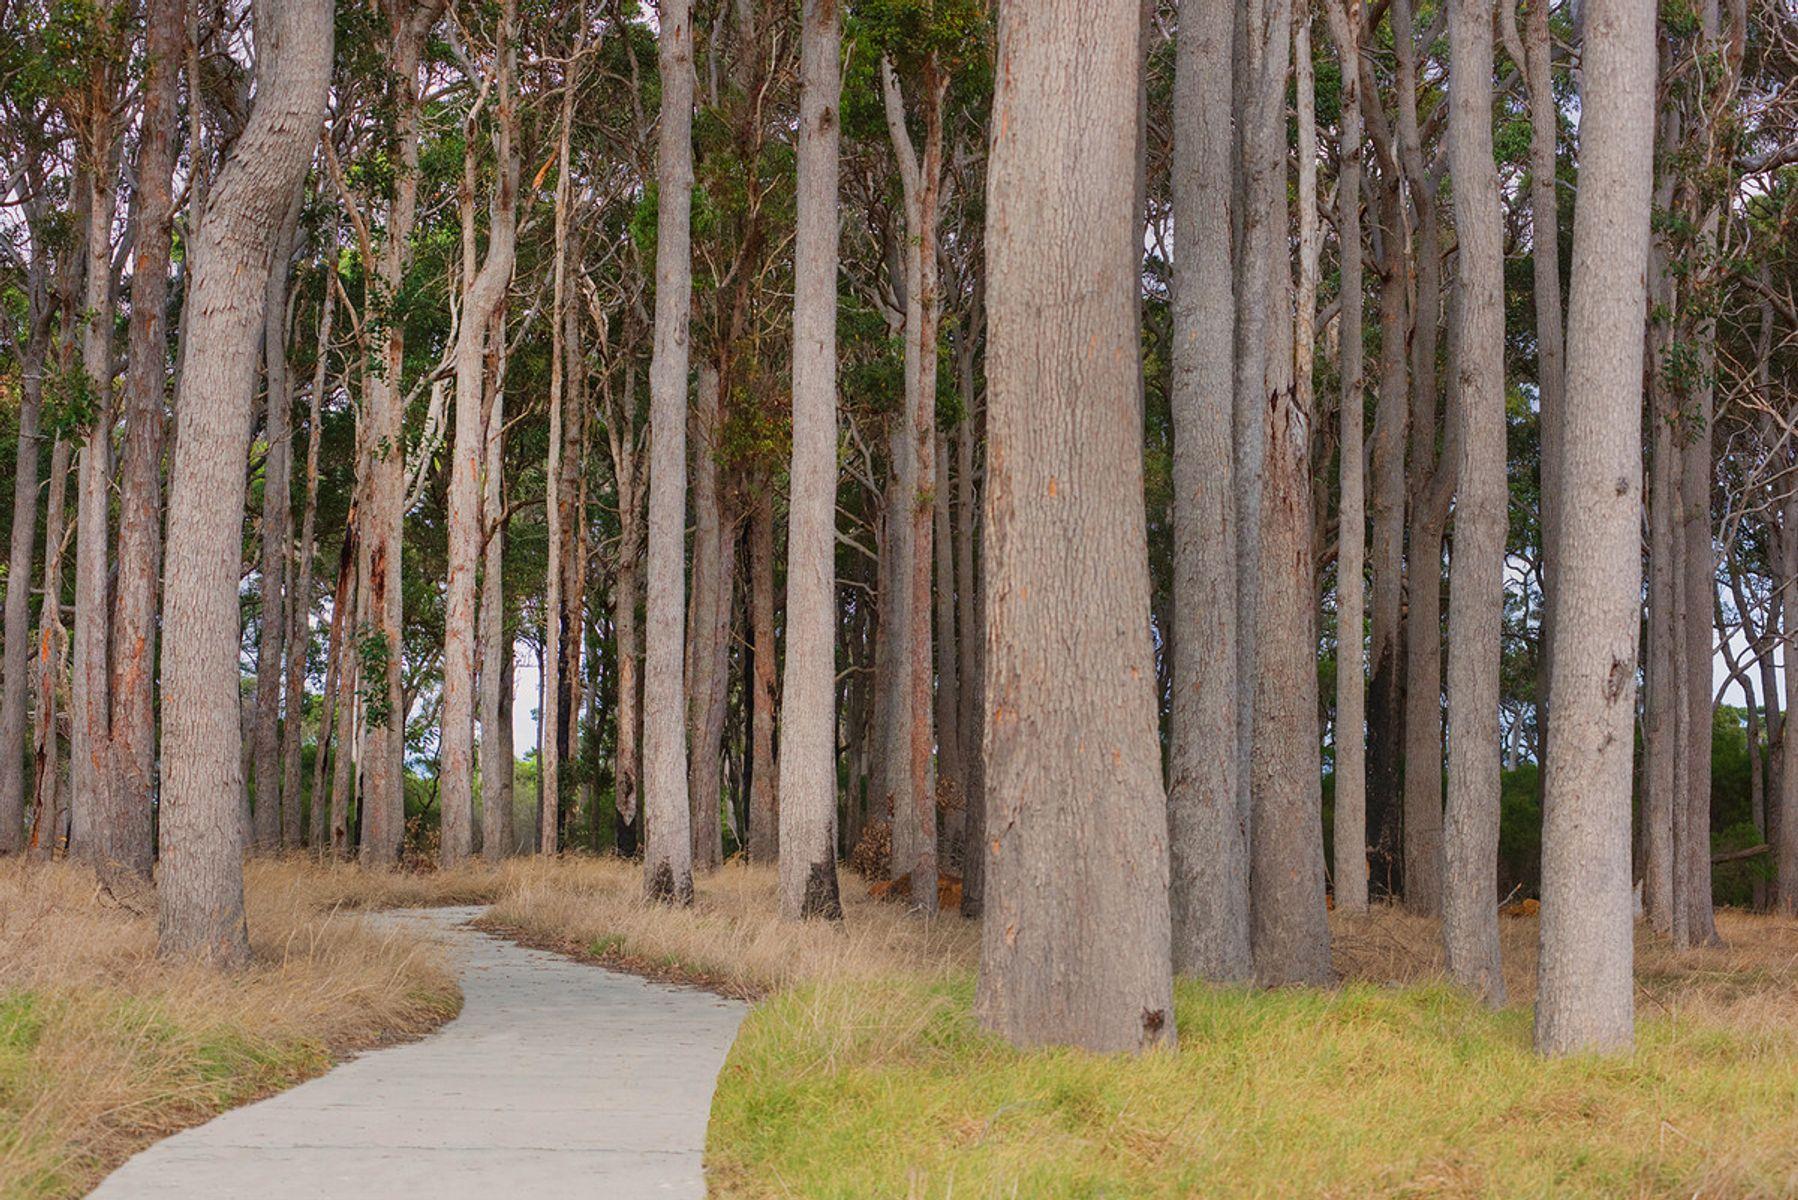 1 Lumber Crescent, Karridale, WA 6288